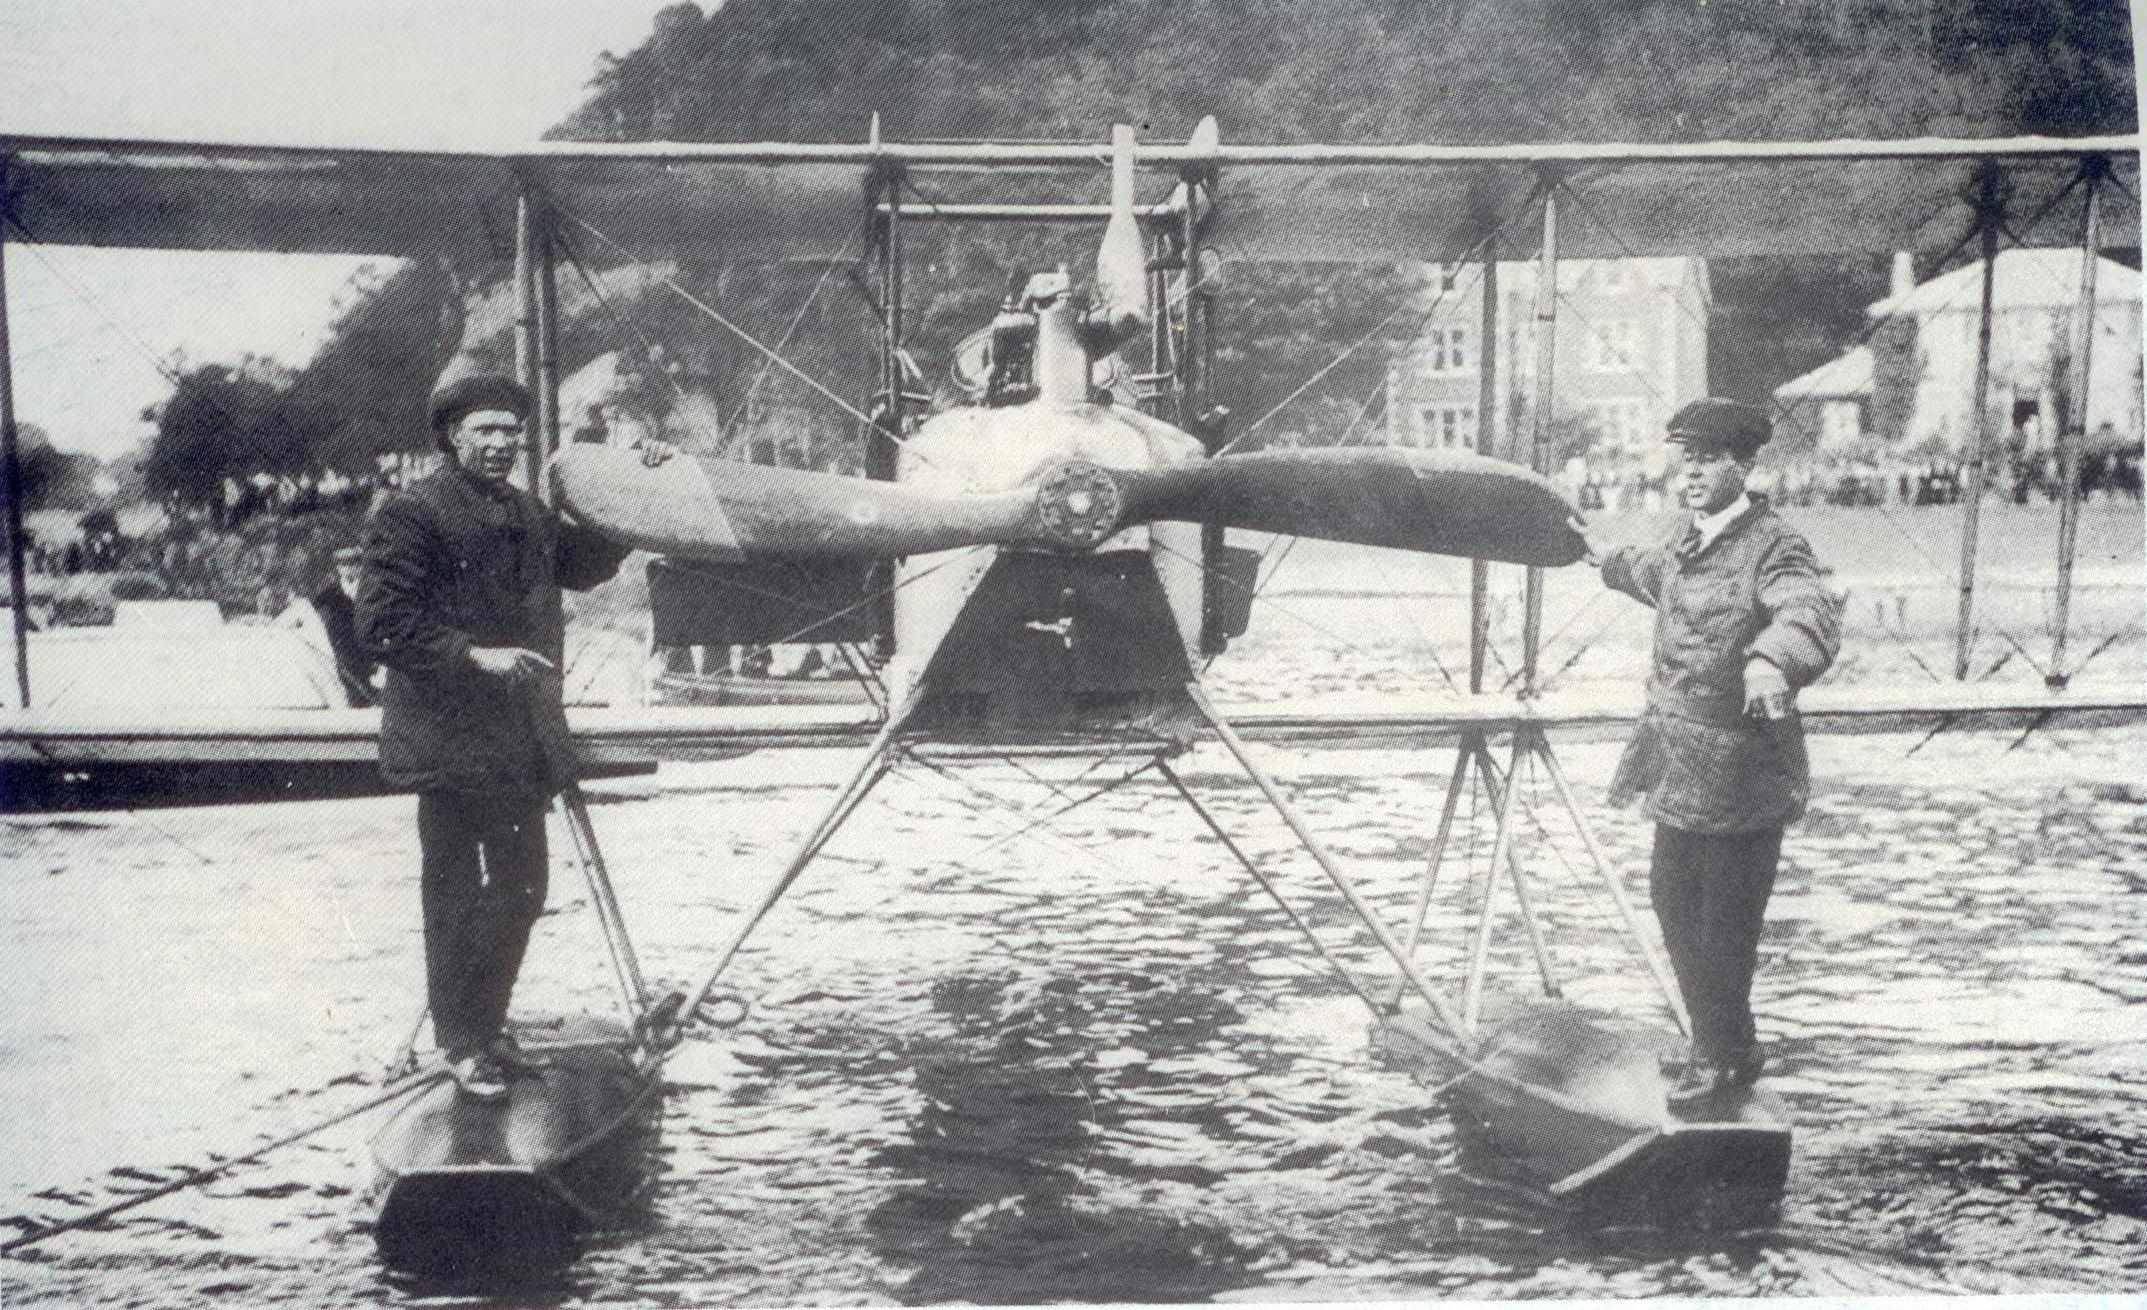 Sopwith-Waterplane-Oban-JB7-2d1dc91